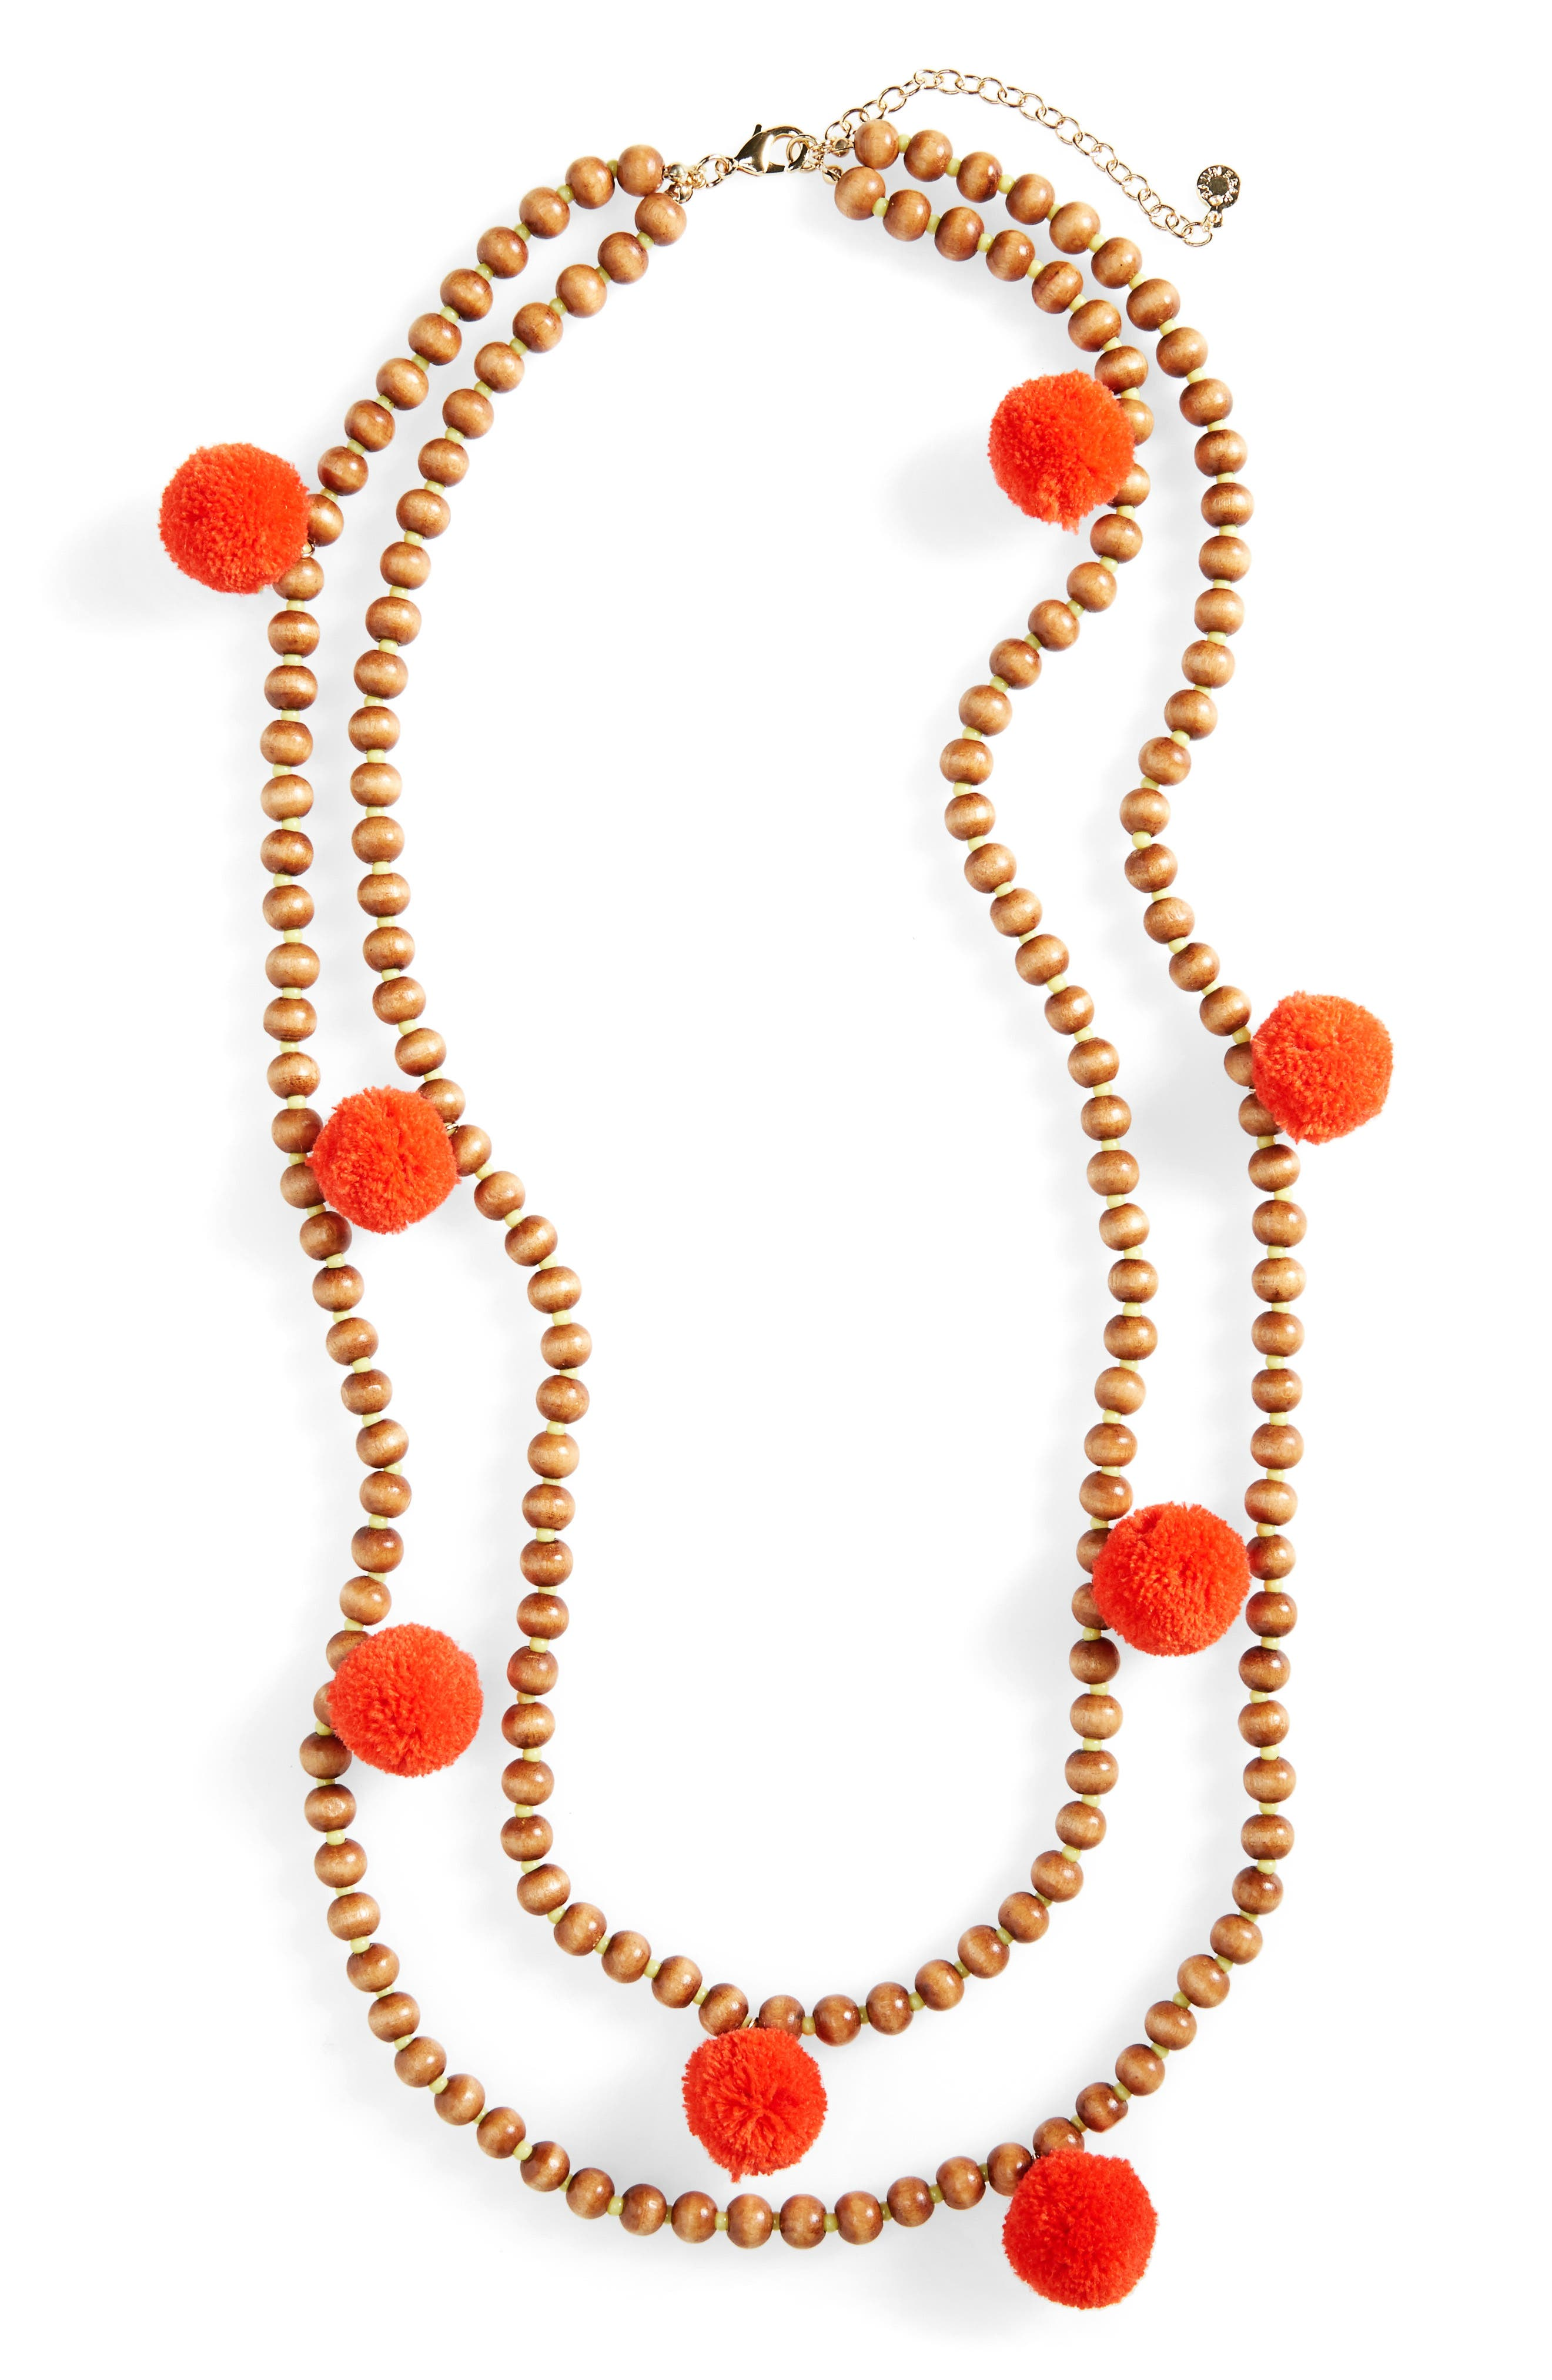 Alternate Image 1 Selected - BaubleBar Grenada Double Strand Pompom Necklace